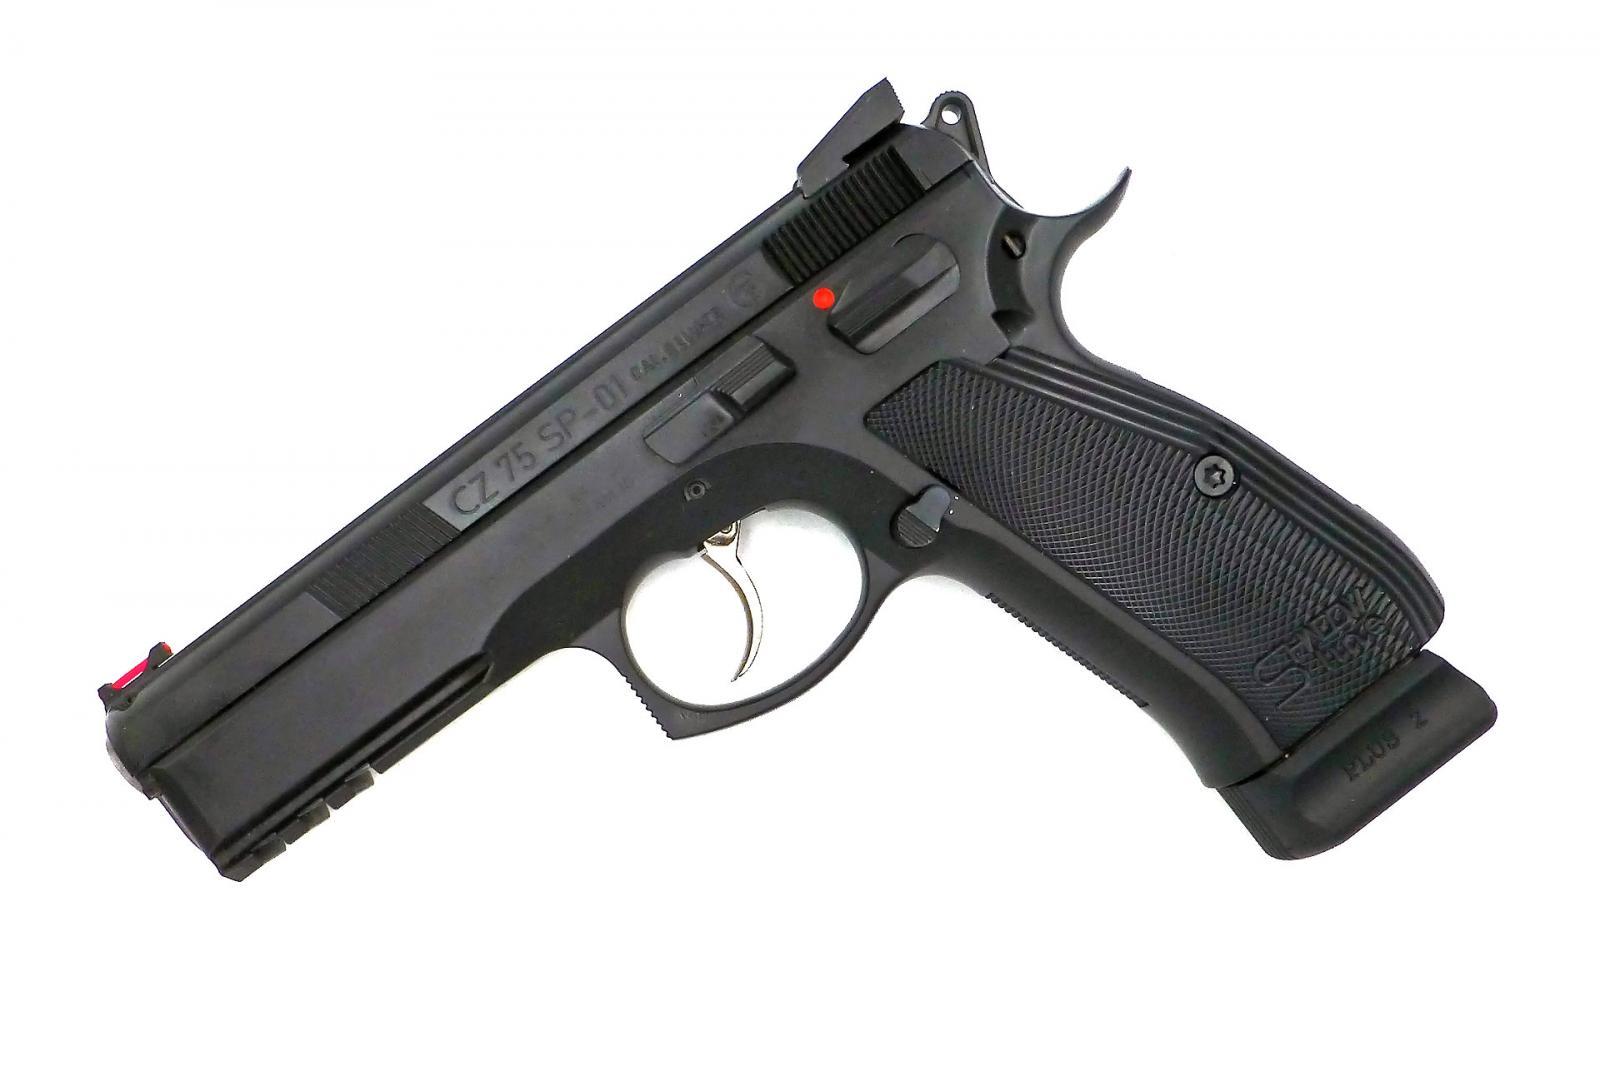 CZ 75 SP01 SHADOW cal 9mm CZ75SPSHA